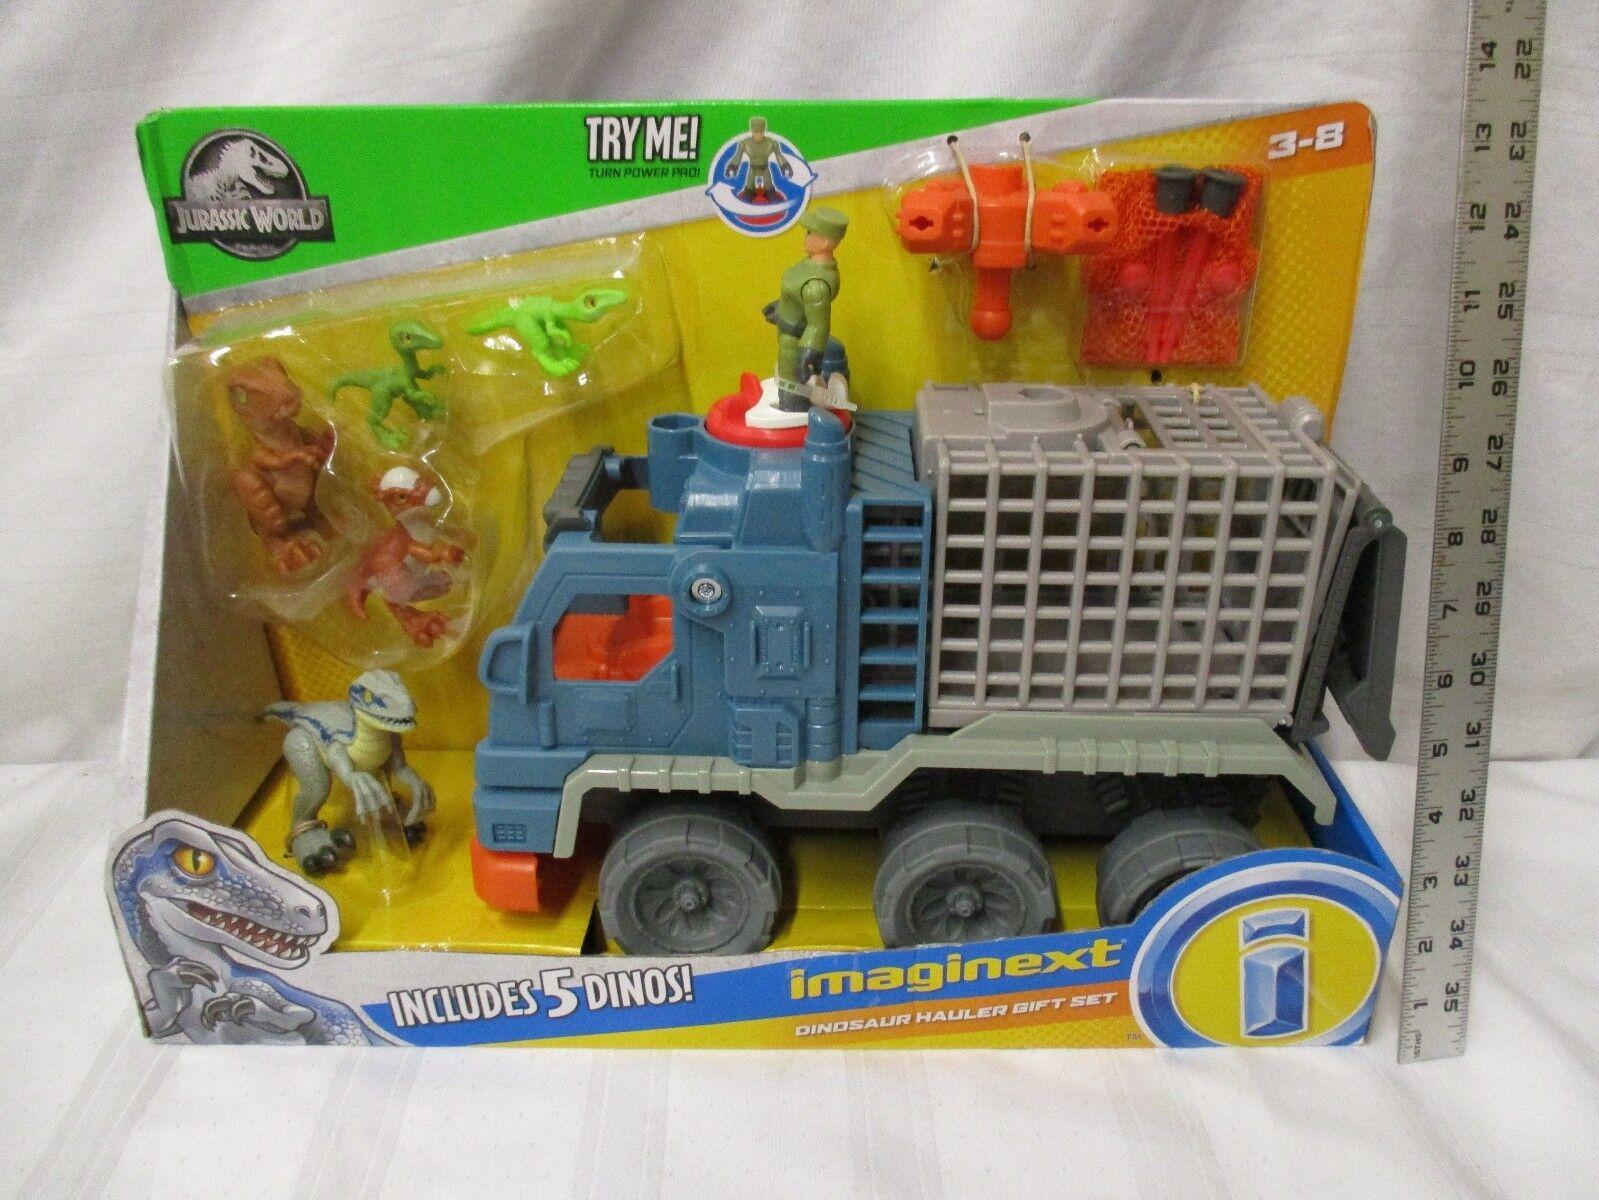 Fisher price Imaginect Jurassic värld Dinosaur Hauler NY Dino cage set